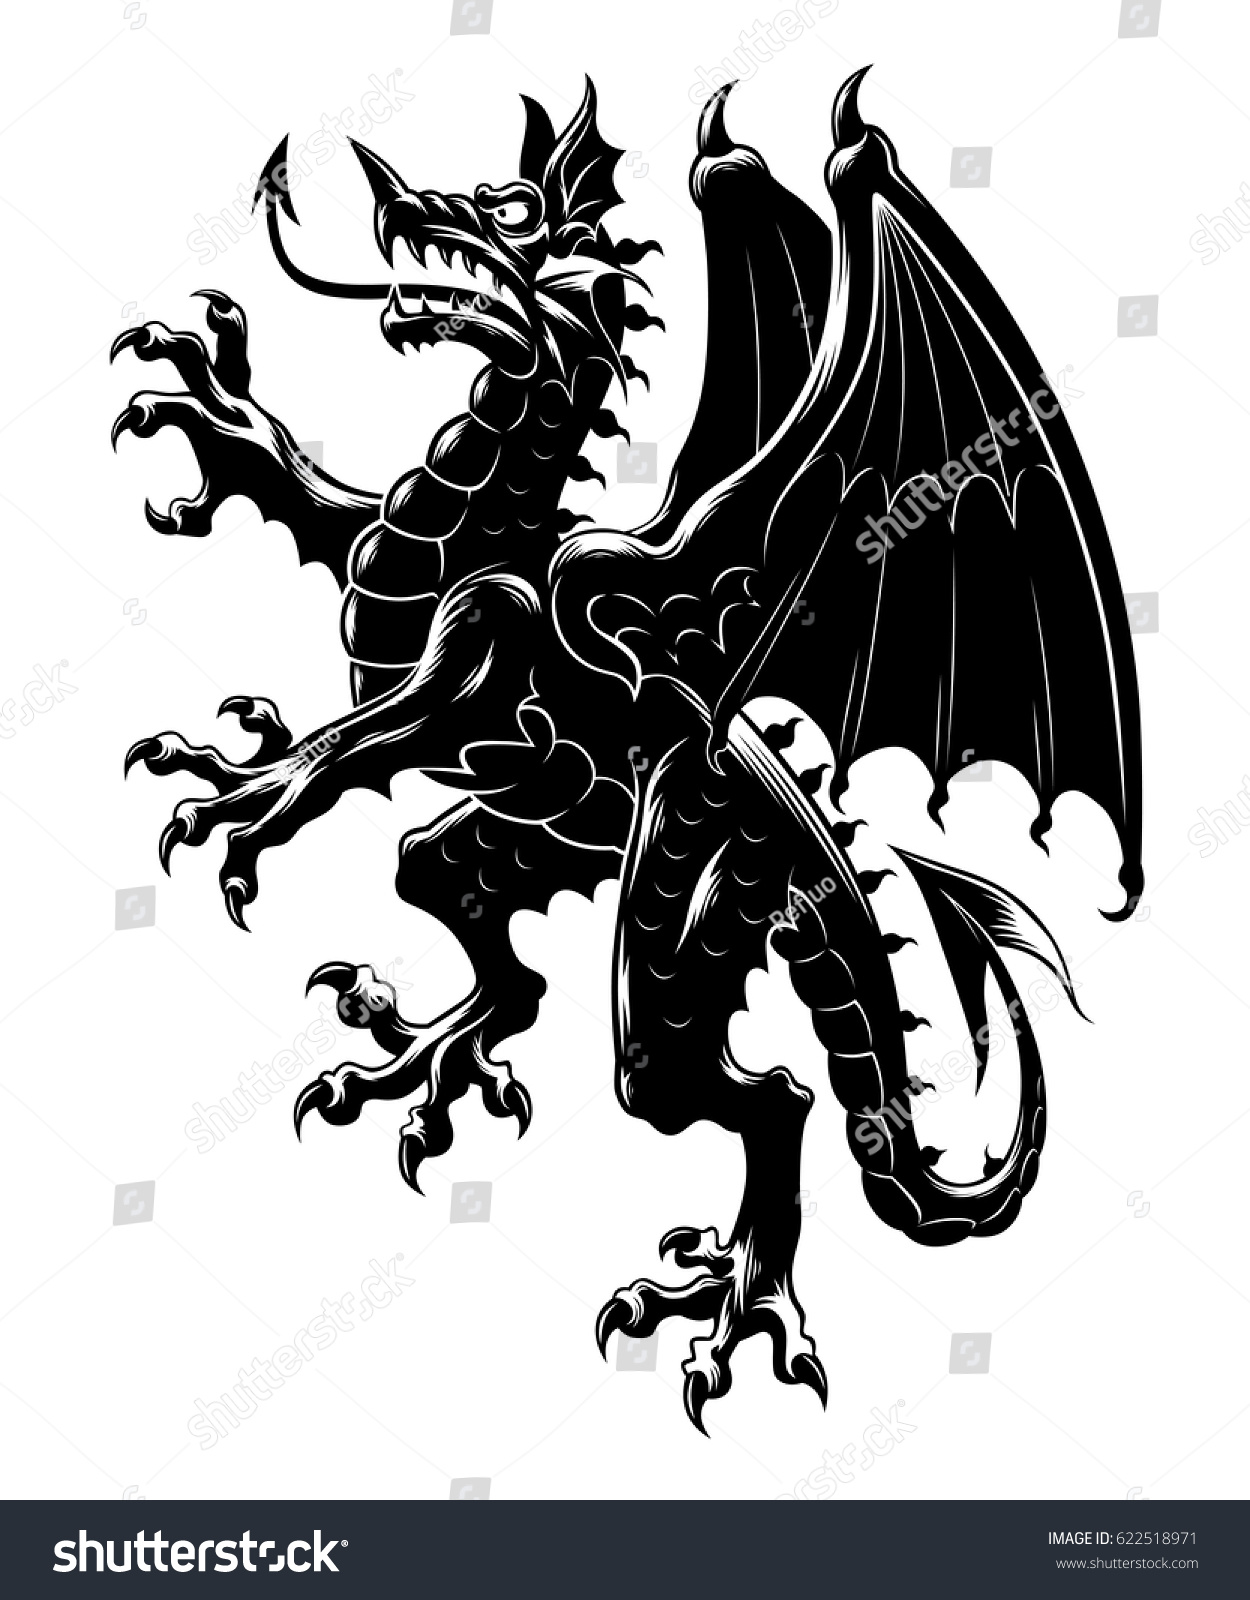 How to breed heraldic dragon - Heraldic Dragon Vertical